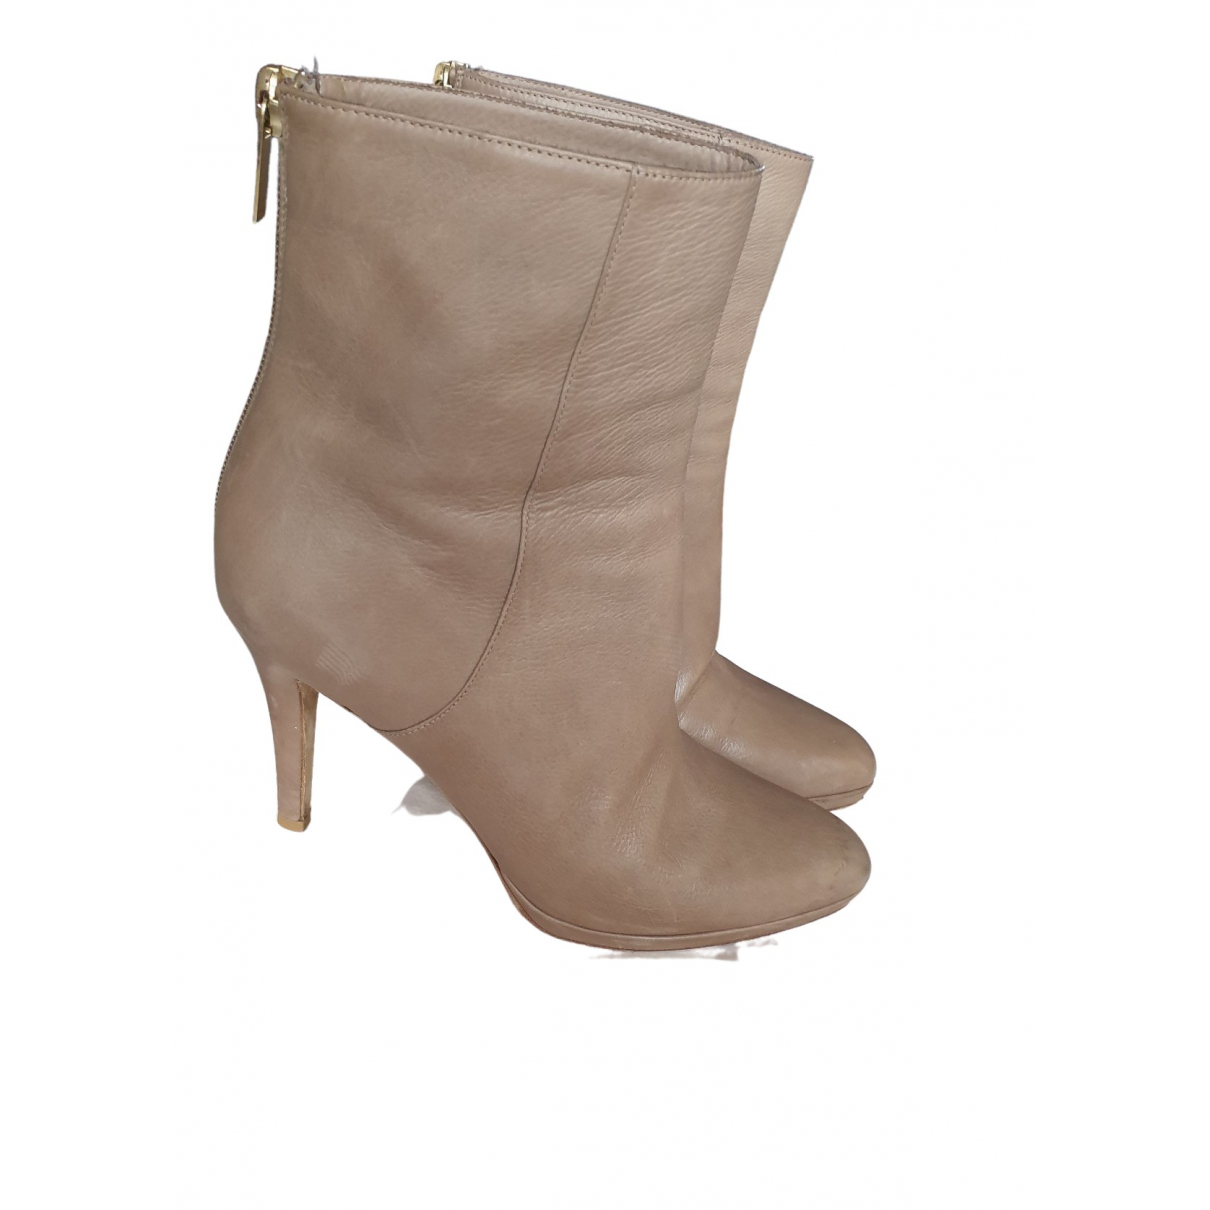 Jimmy Choo \N Beige Leather Ankle boots for Women 36.5 EU